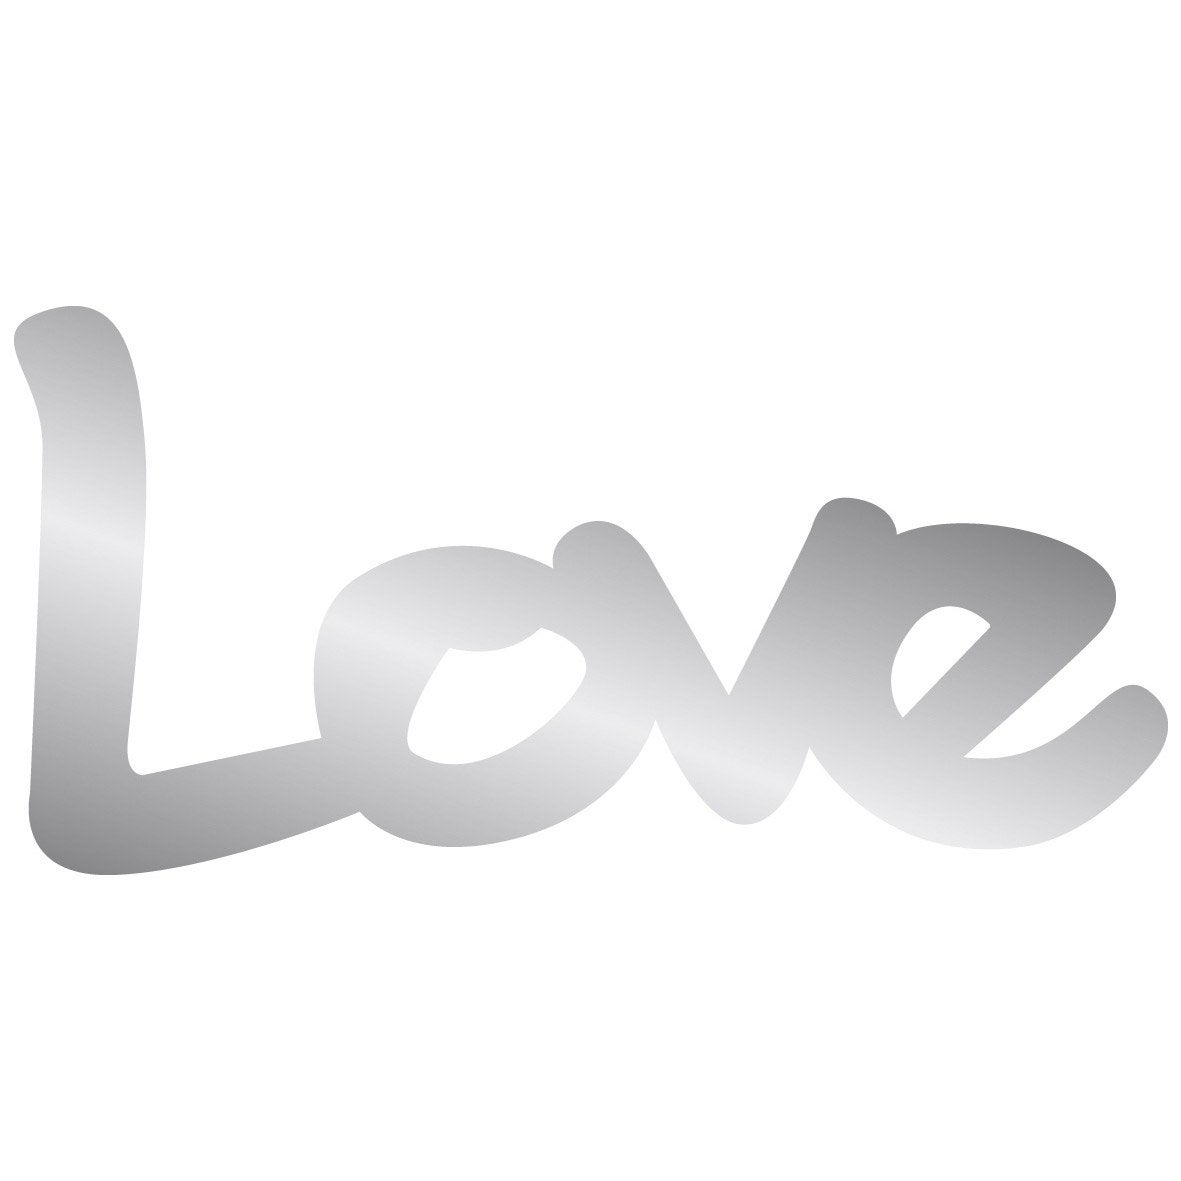 miroir en plexiglass mot love 10 cm x 20 cm leroy merlin. Black Bedroom Furniture Sets. Home Design Ideas